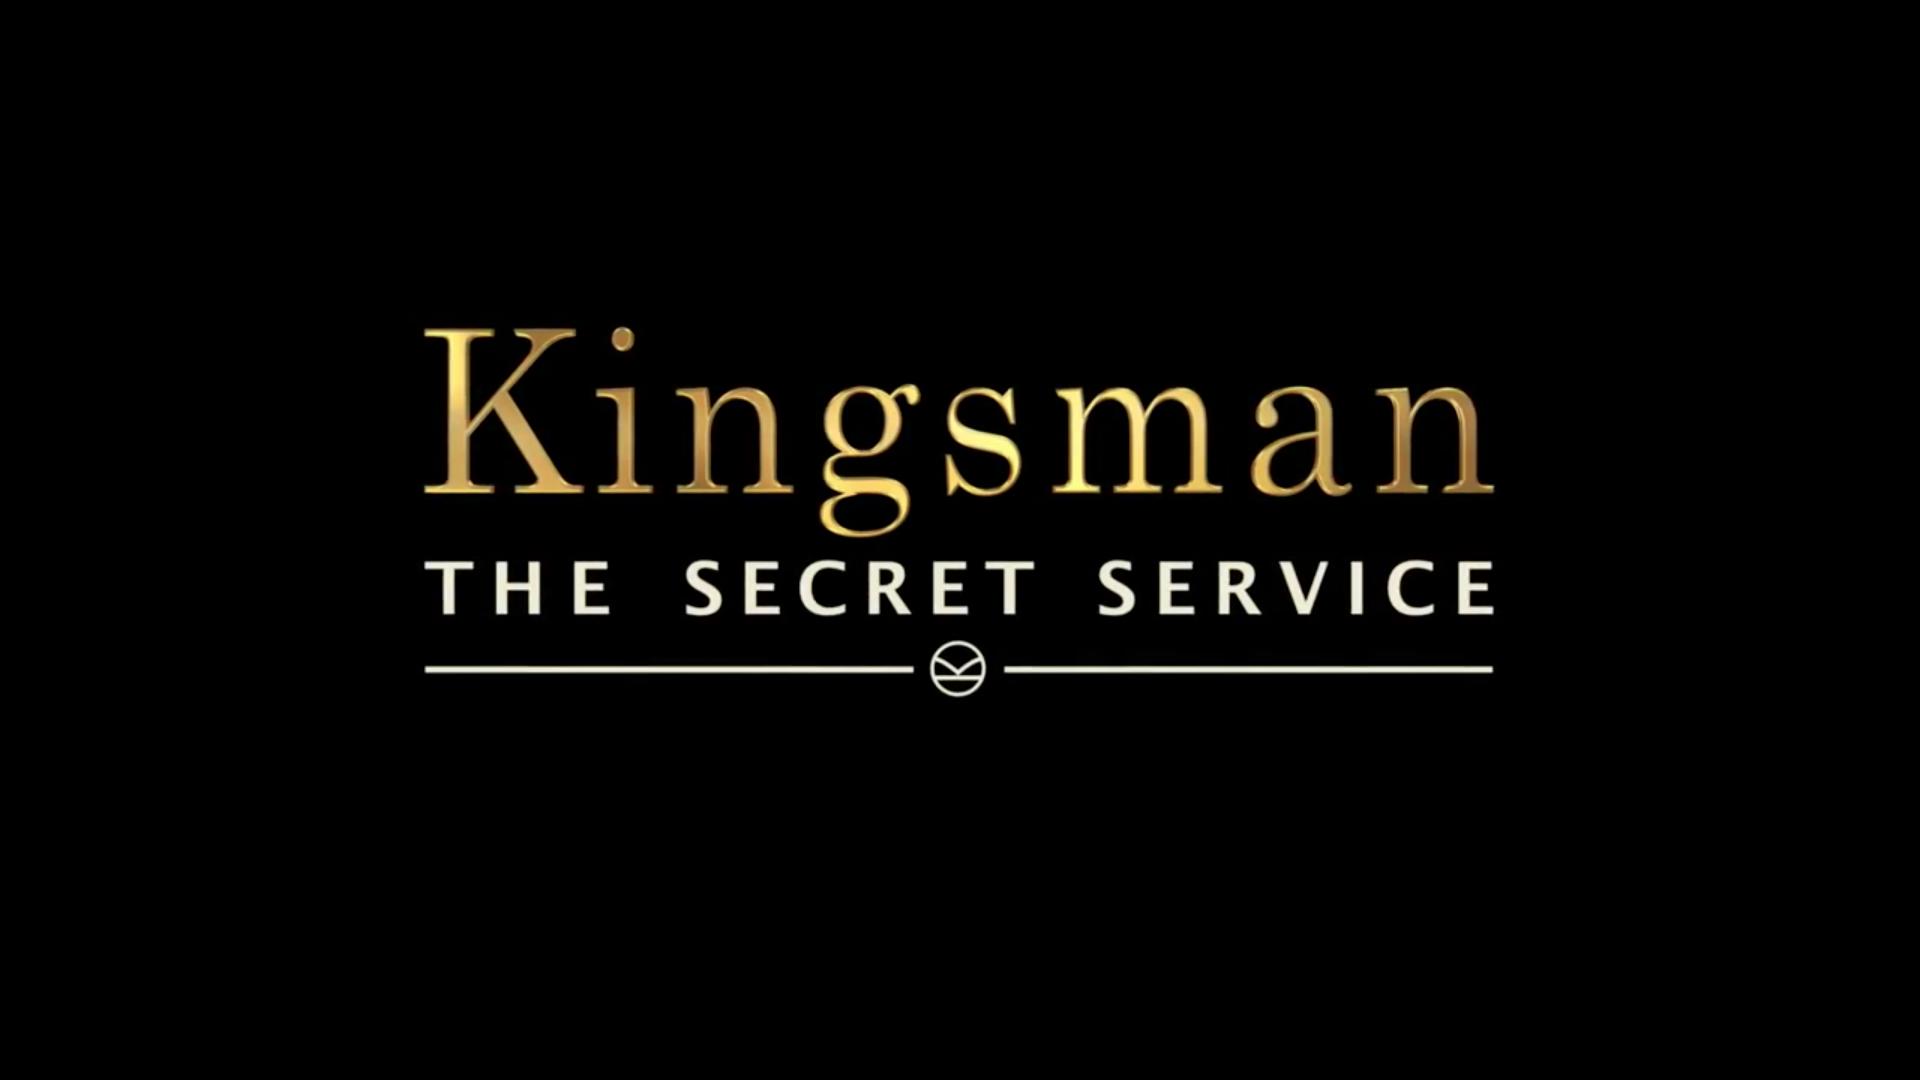 Kingsman The Secret Service 2015 A Source Of Rice